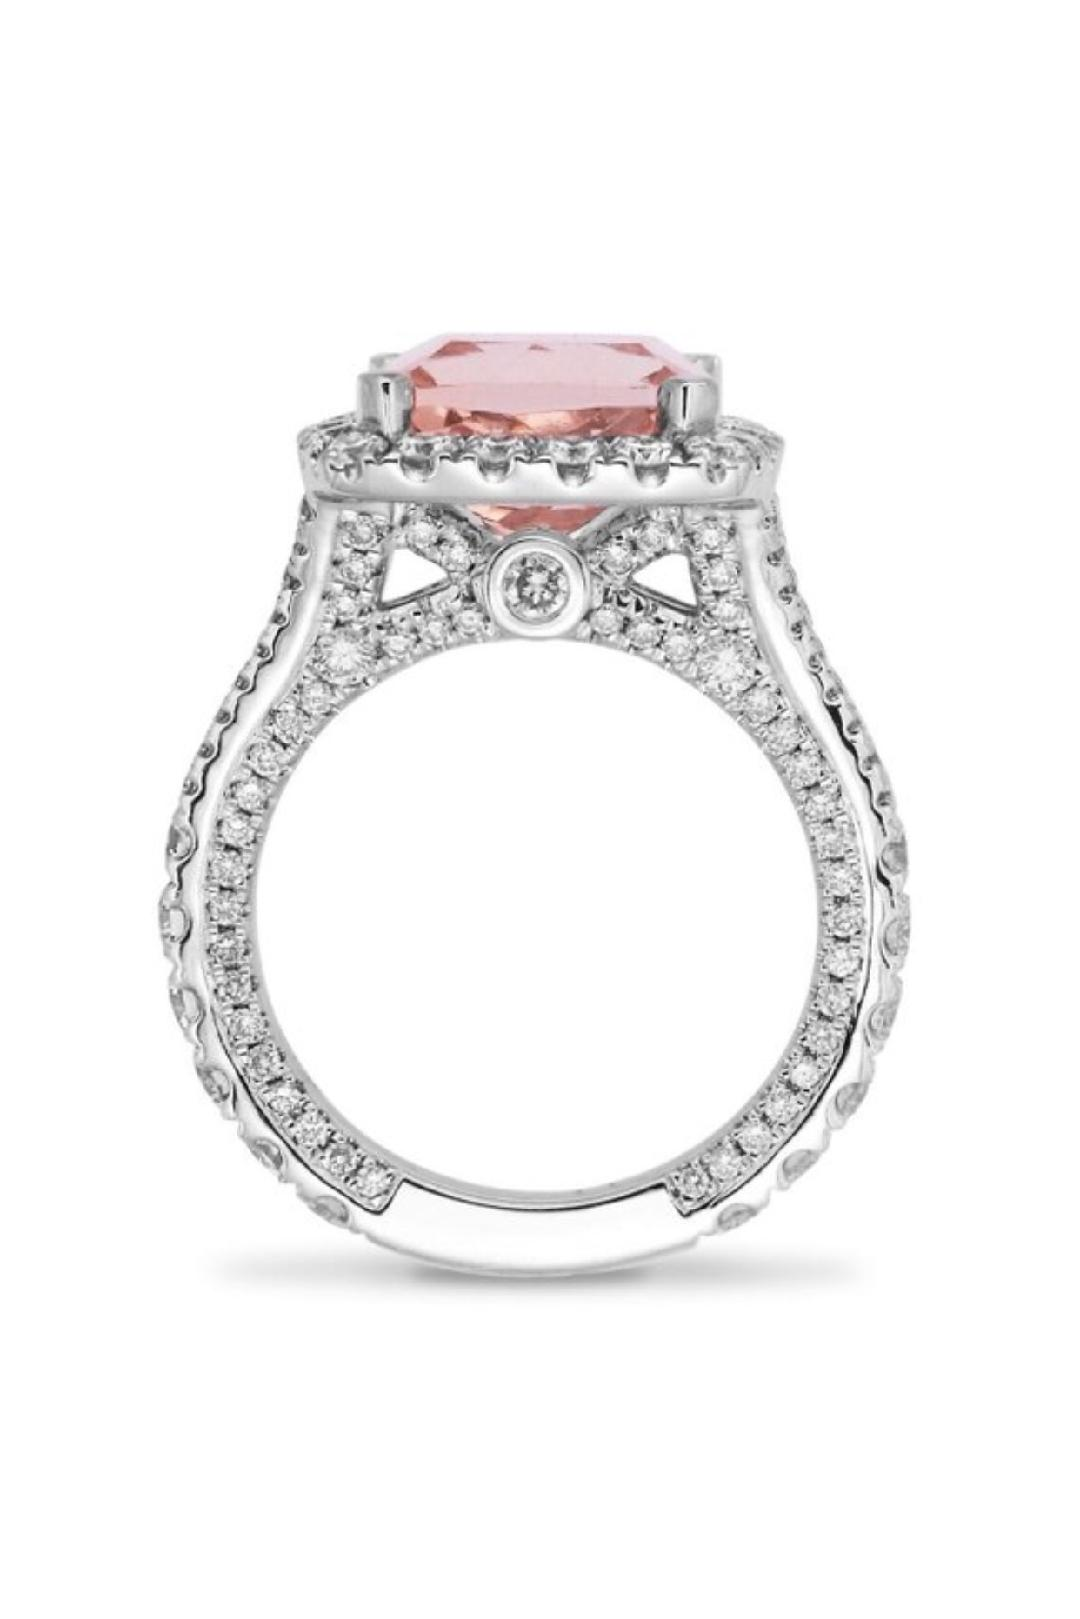 custom made engagement rings  pristine.jpg